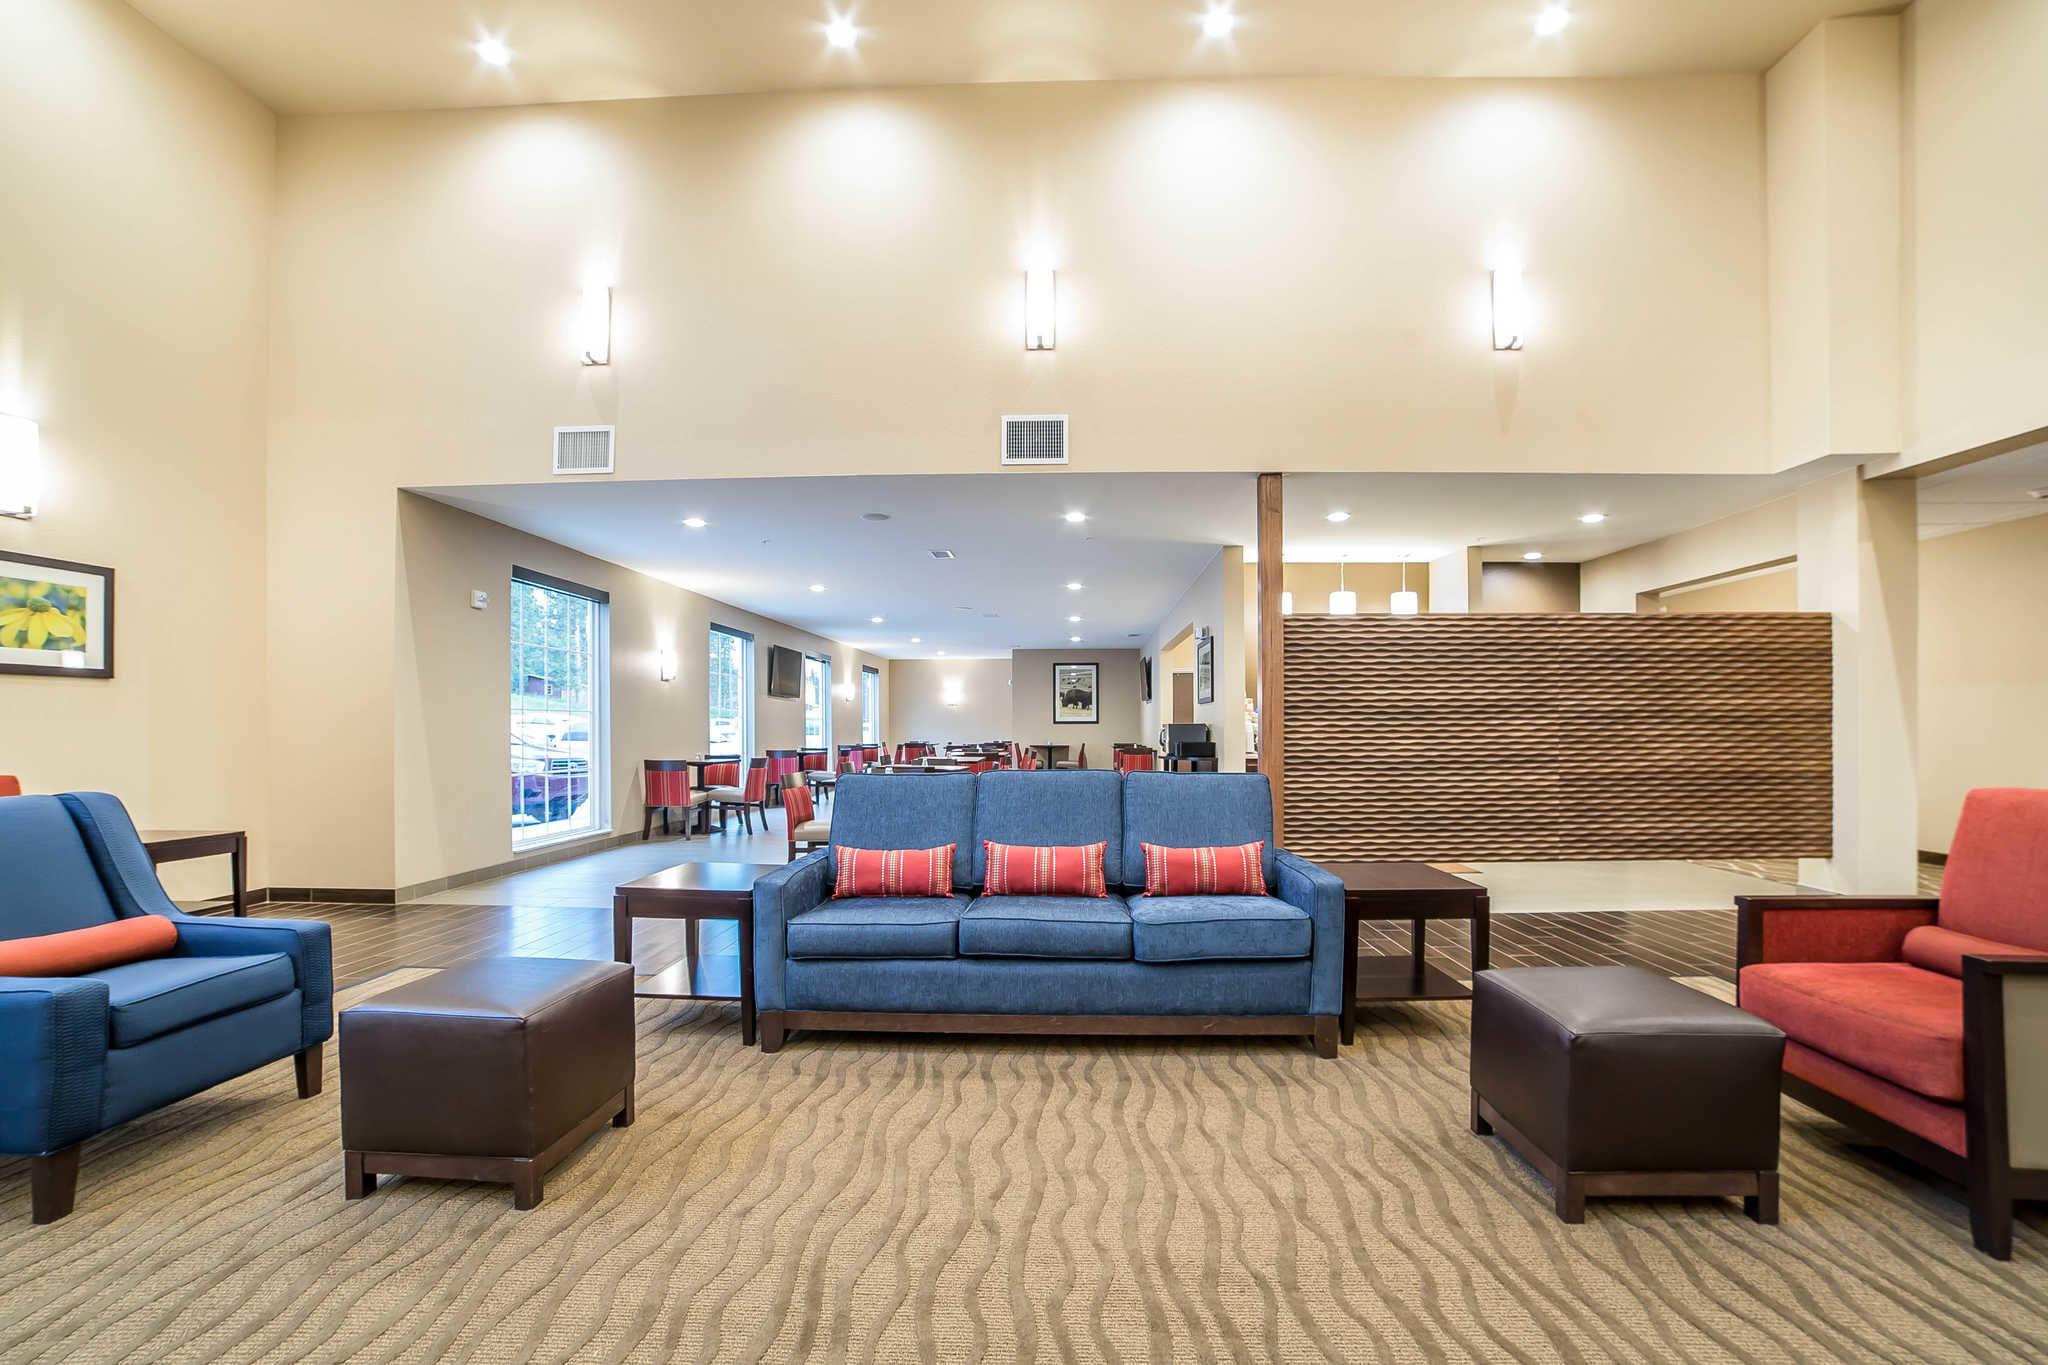 Comfort Inn & Suites Near Mt. Rushmore image 6